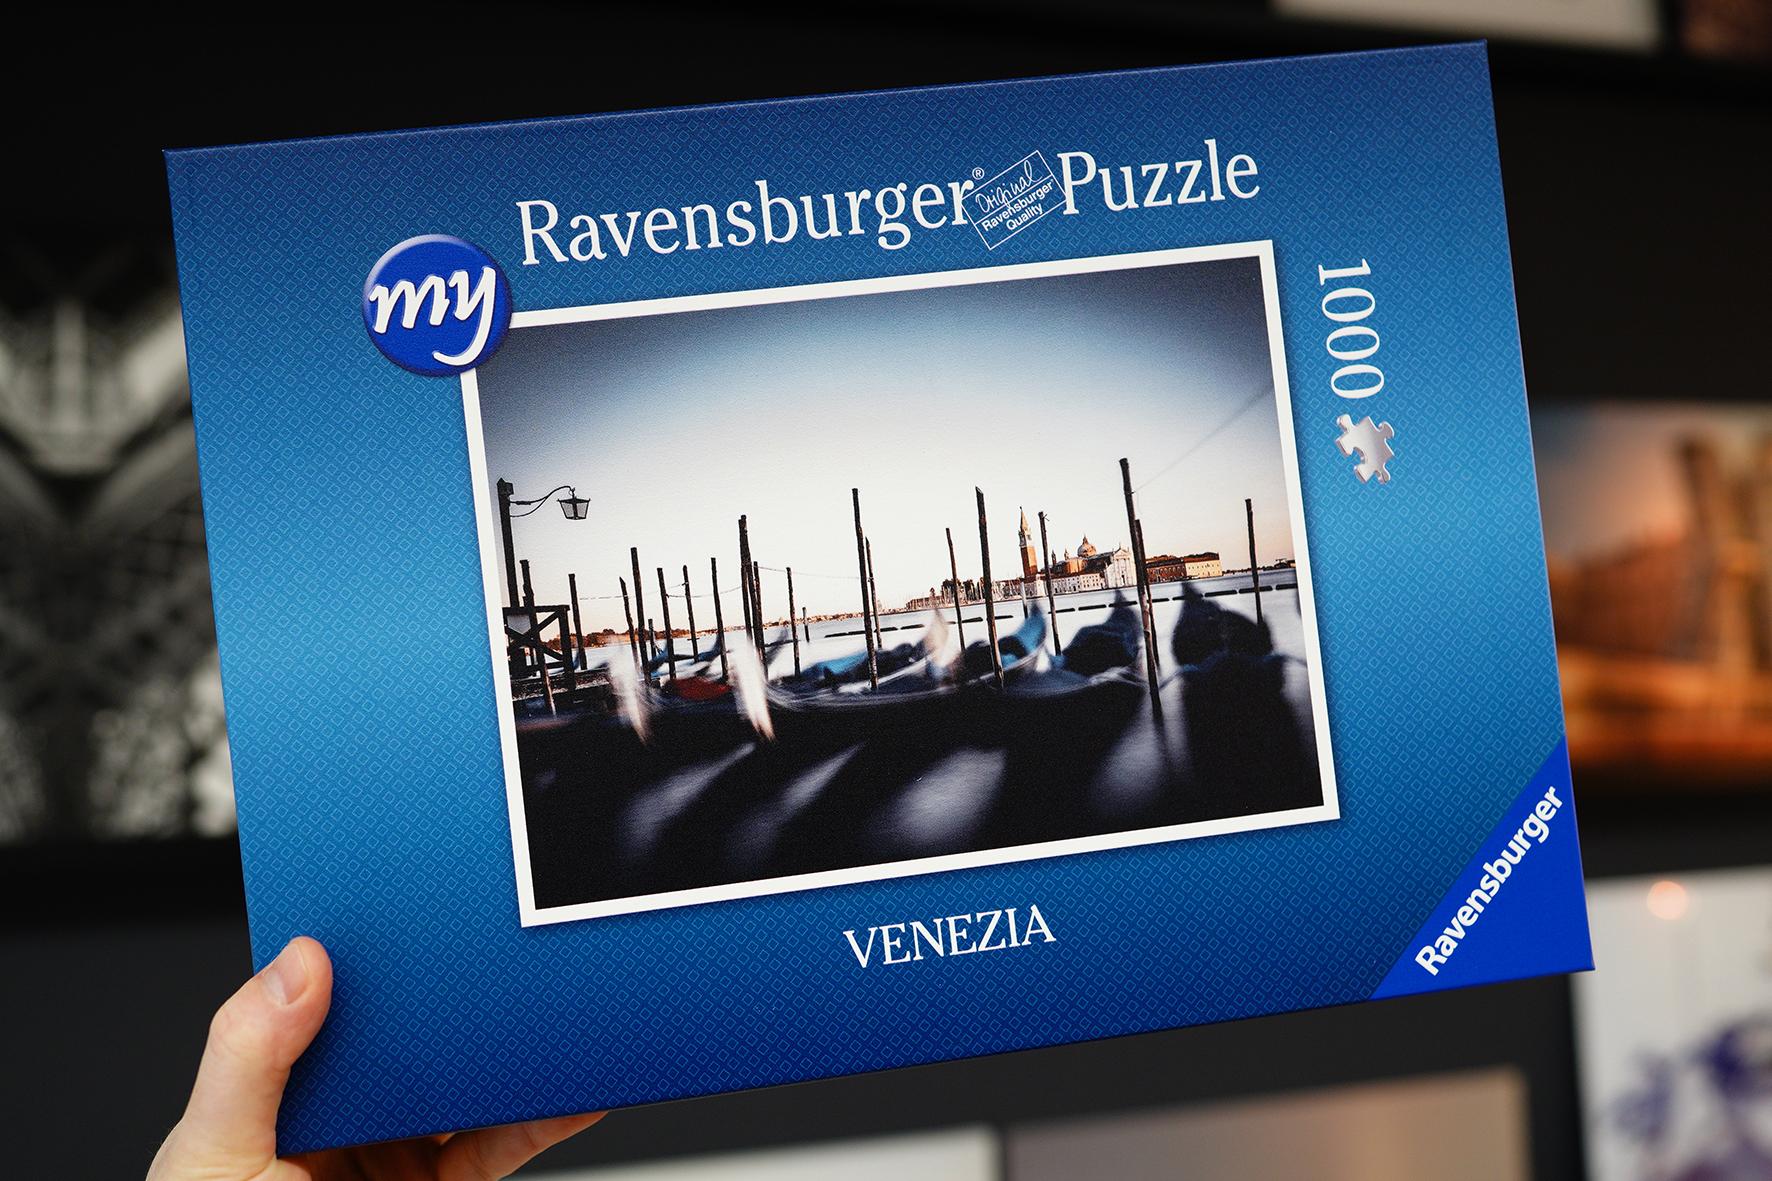 my Ravensburger Puzzle